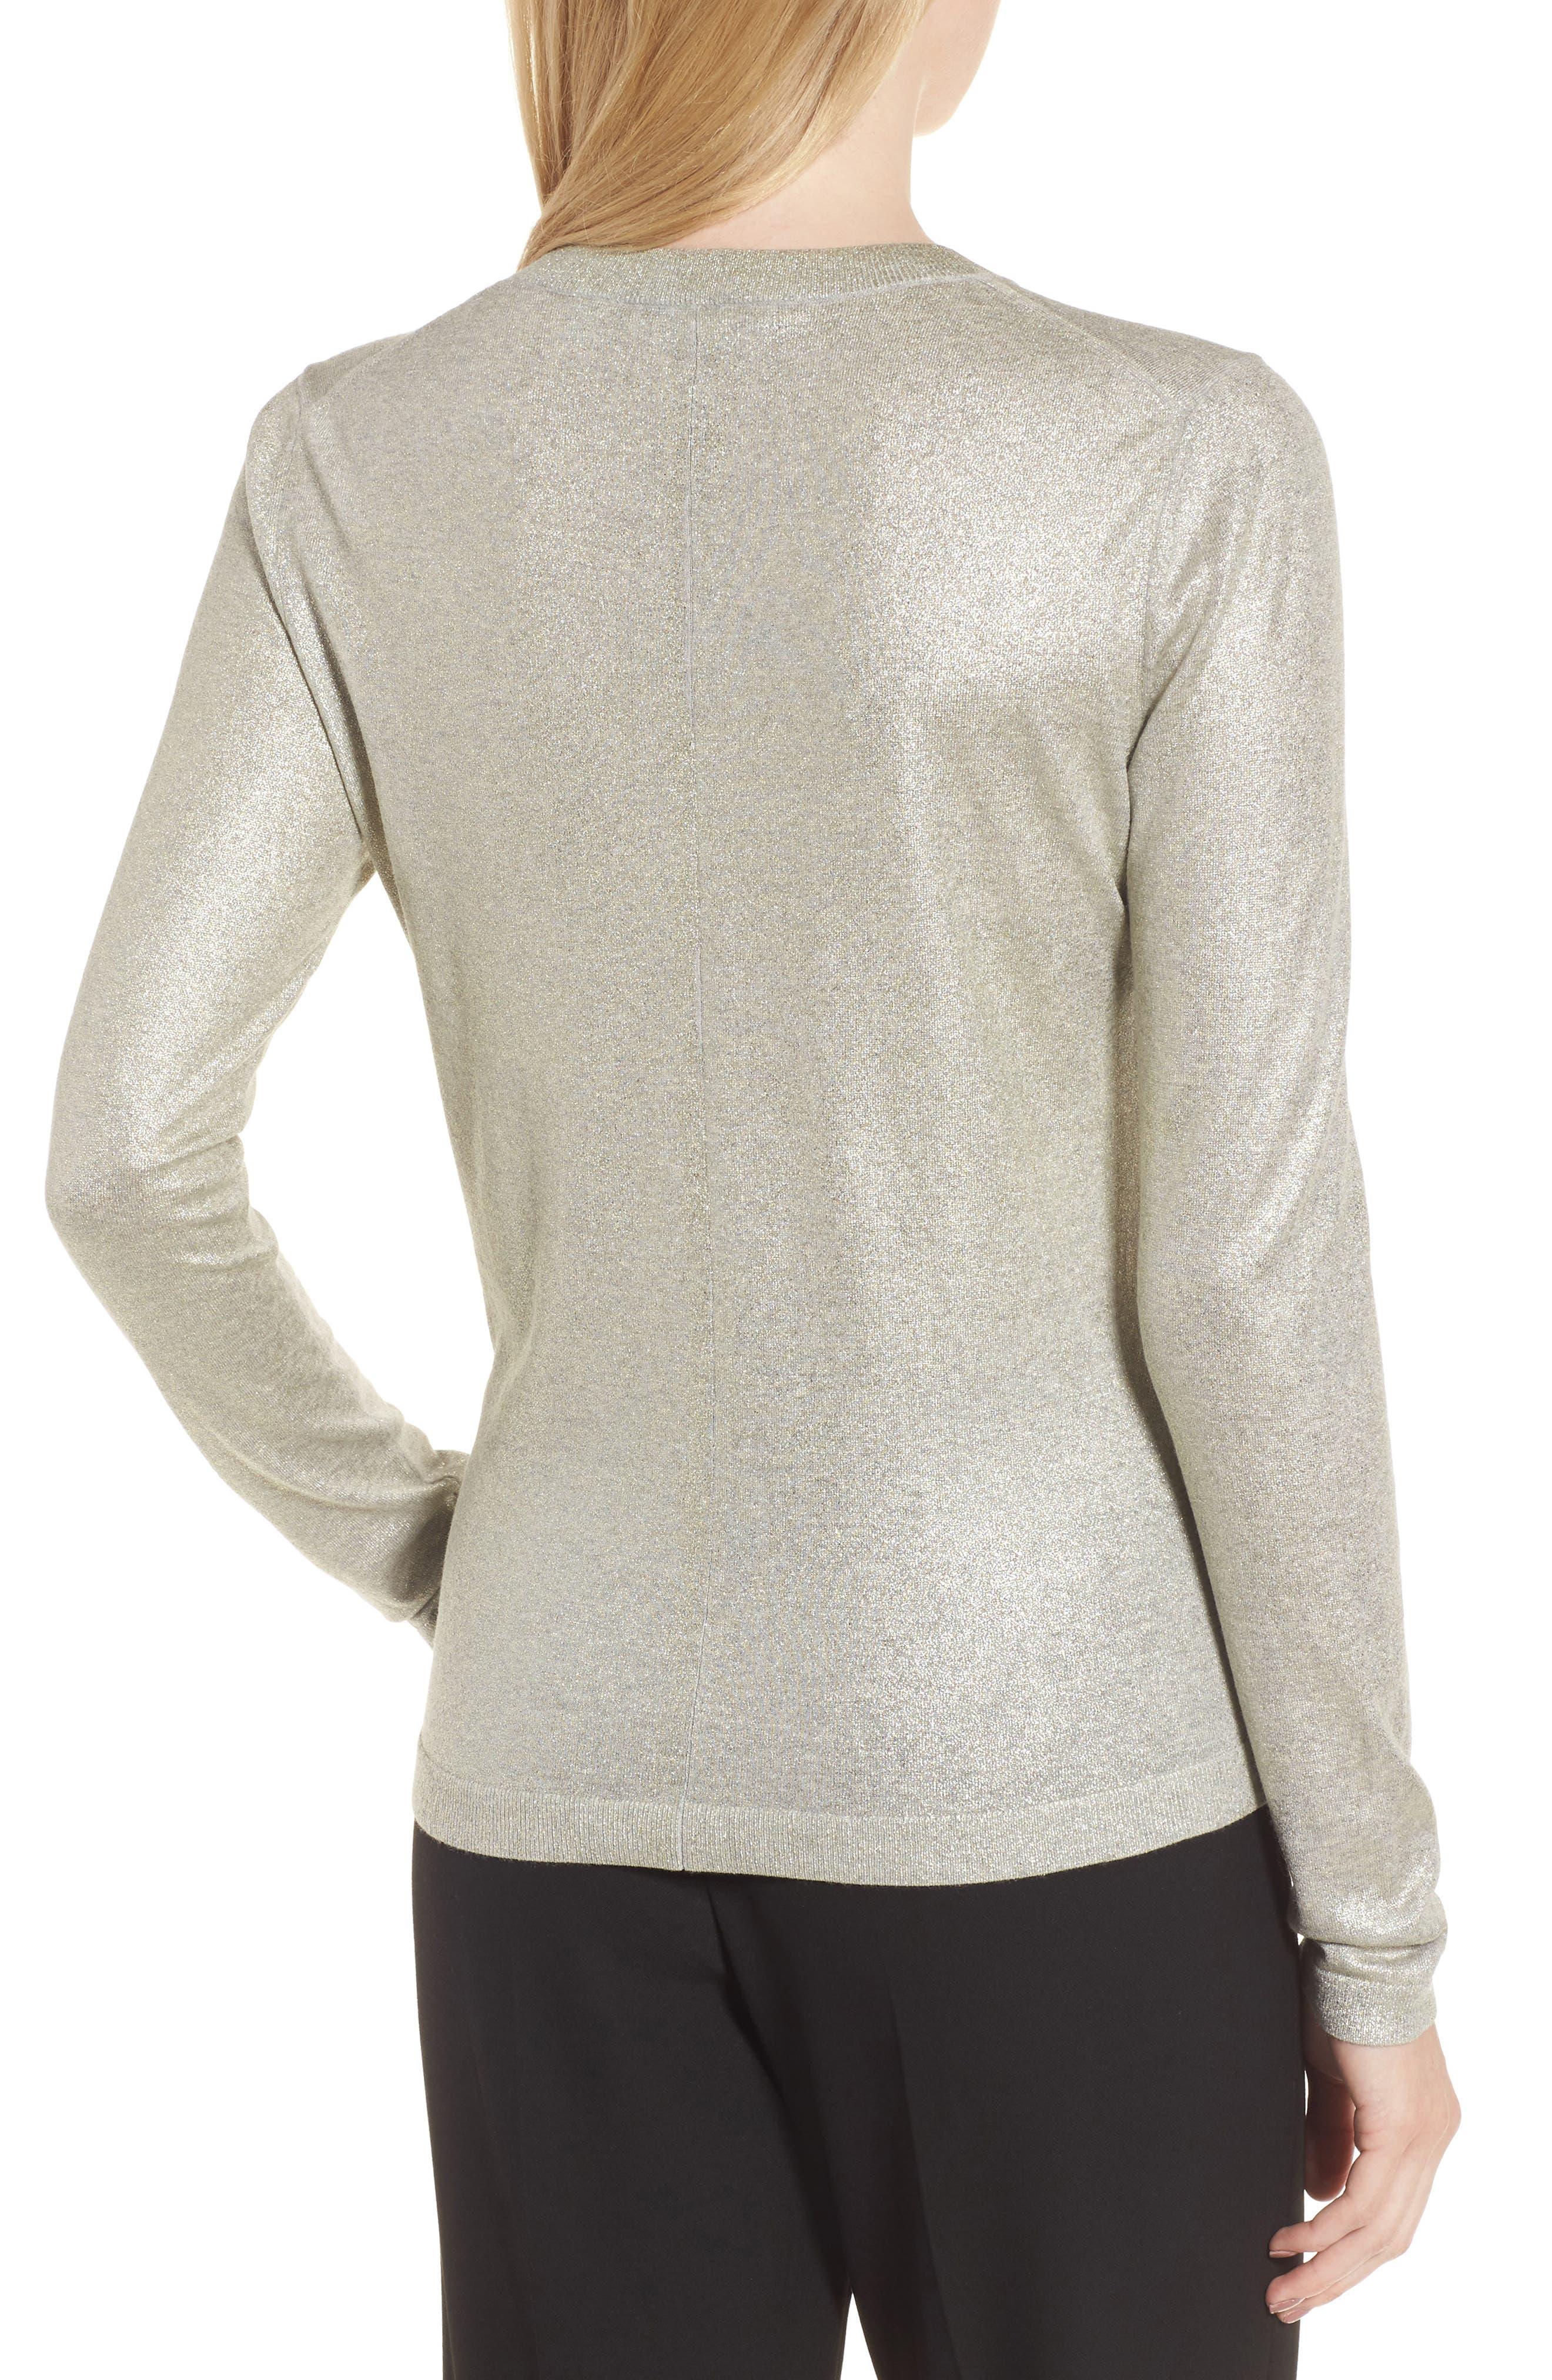 Fadine Wool Crewneck Sweater,                             Alternate thumbnail 2, color,                             Cozy Grey Melange